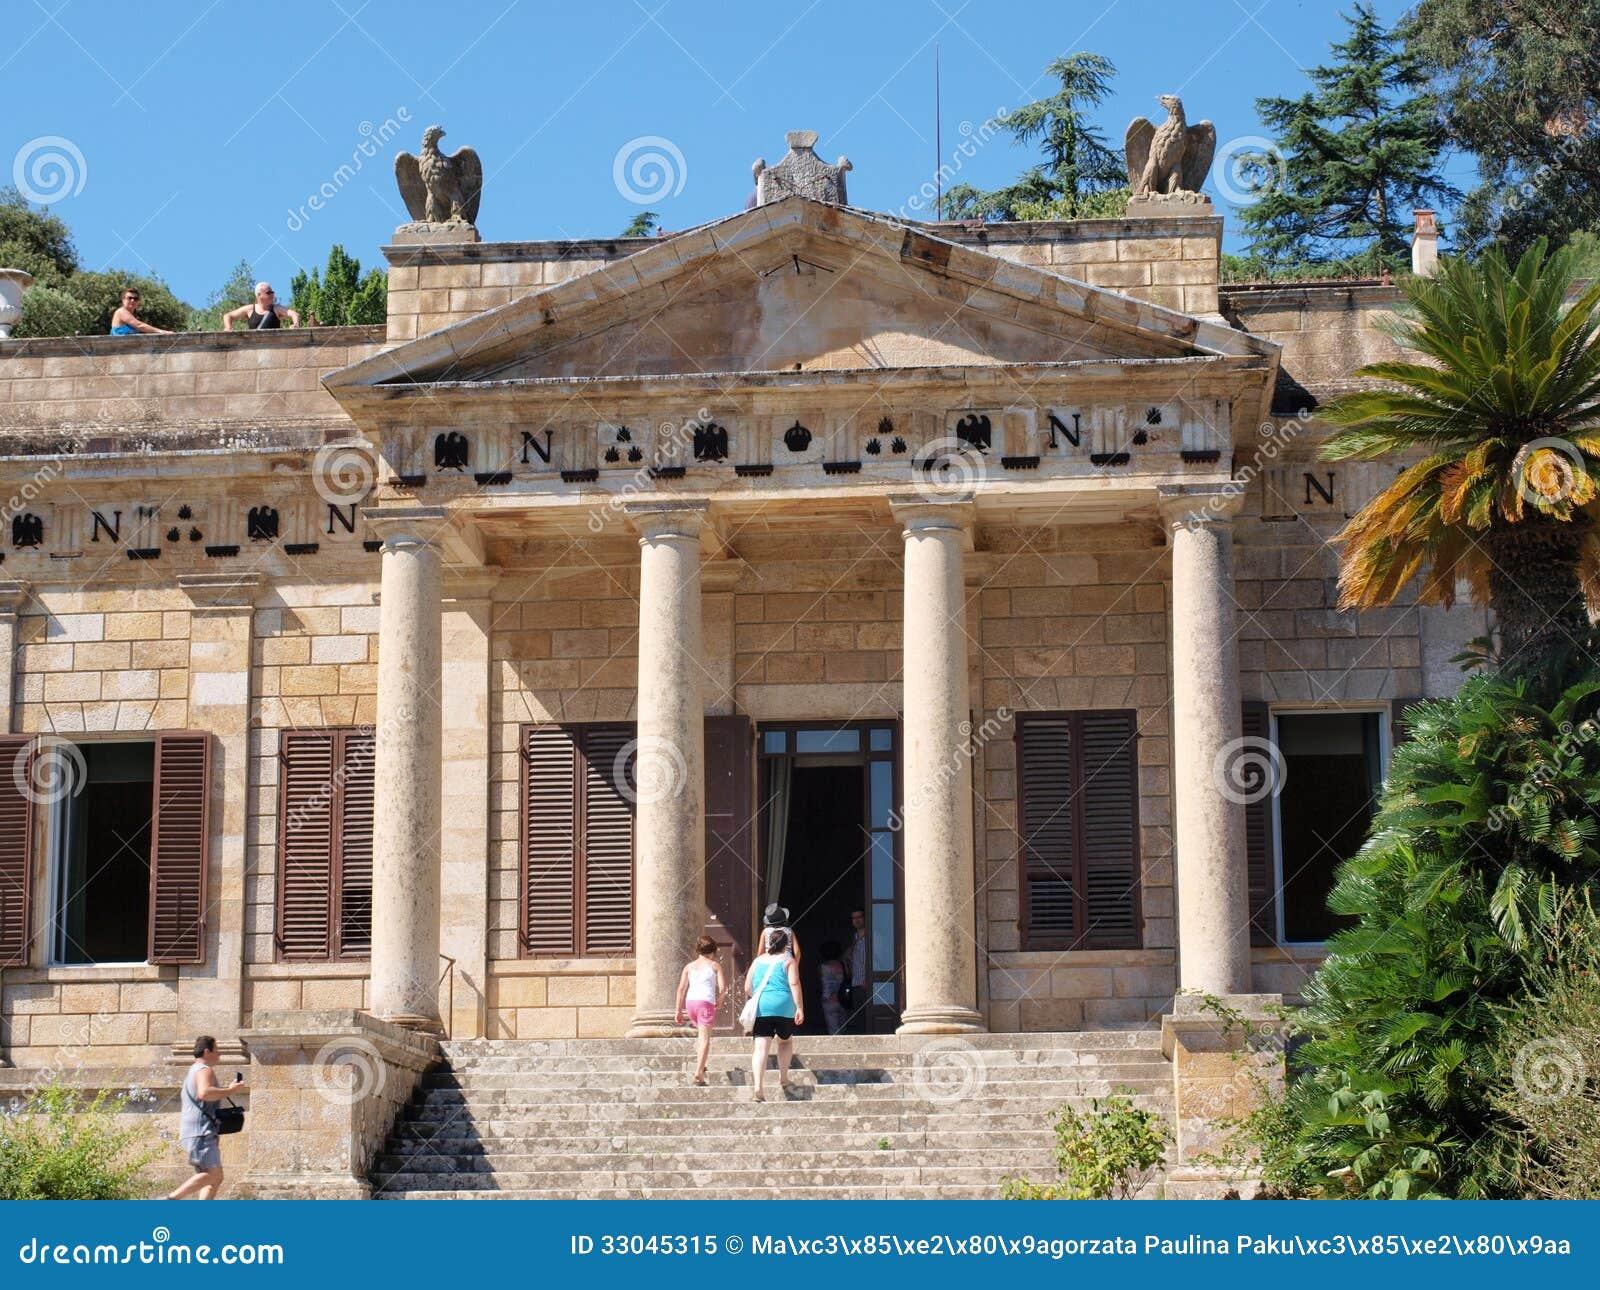 villa san martino san martino elba italy visiting napoleon bonapartes private house his exile isle 33045315